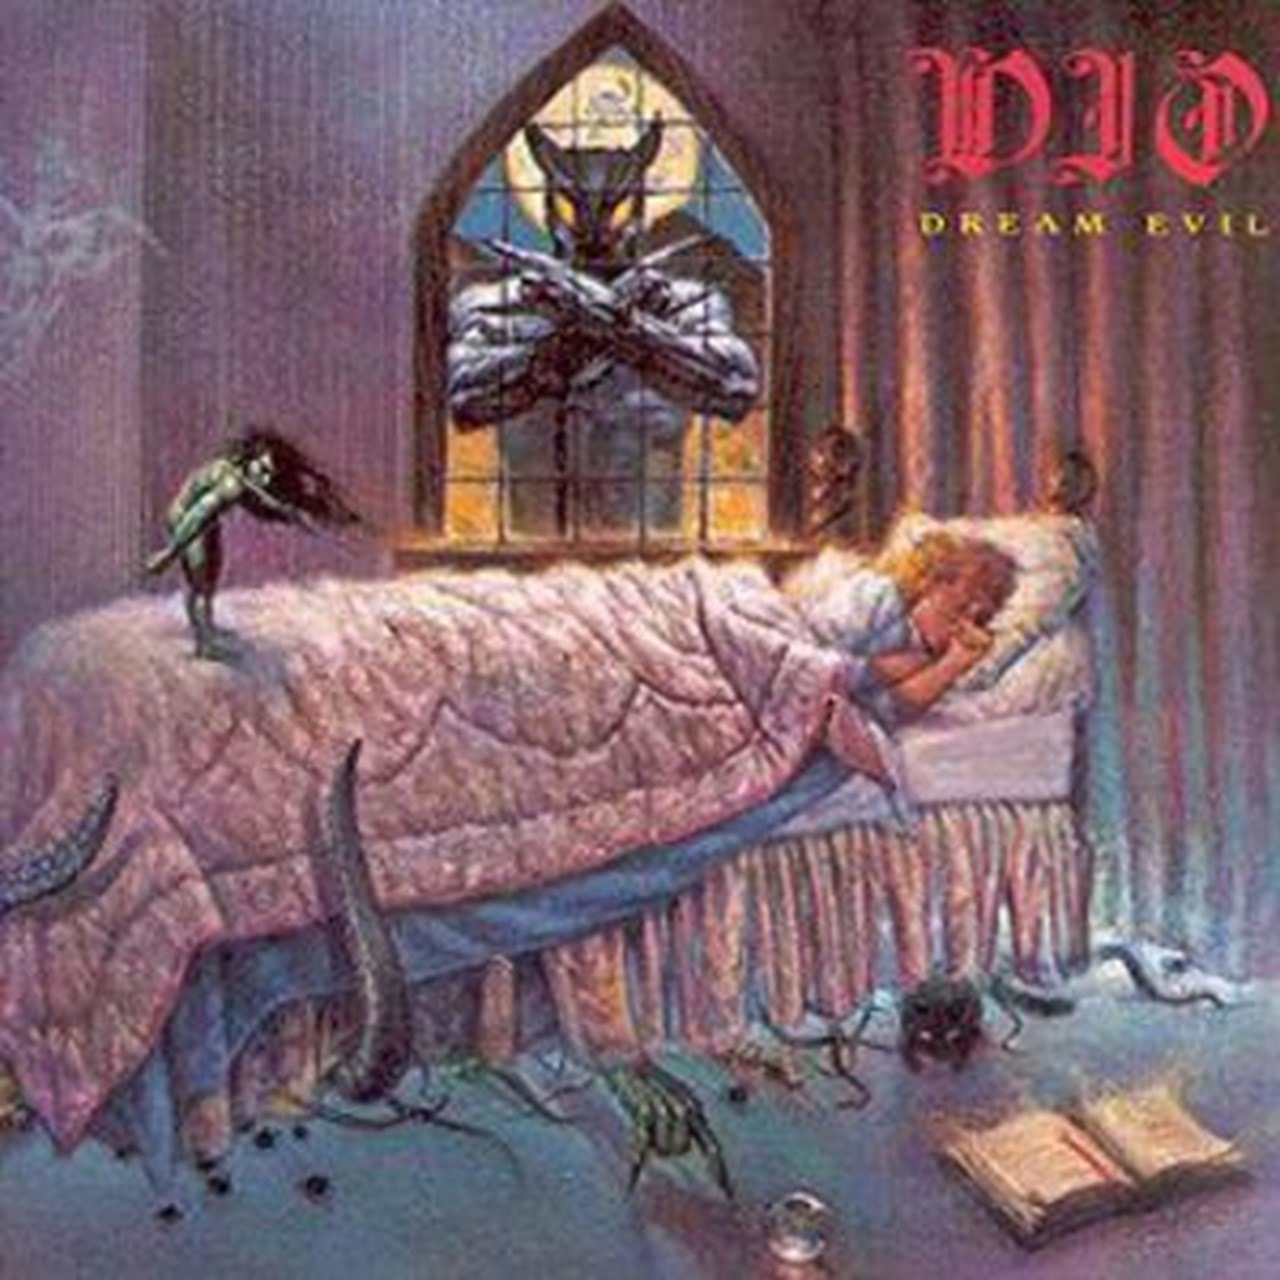 Dream Evil - 1